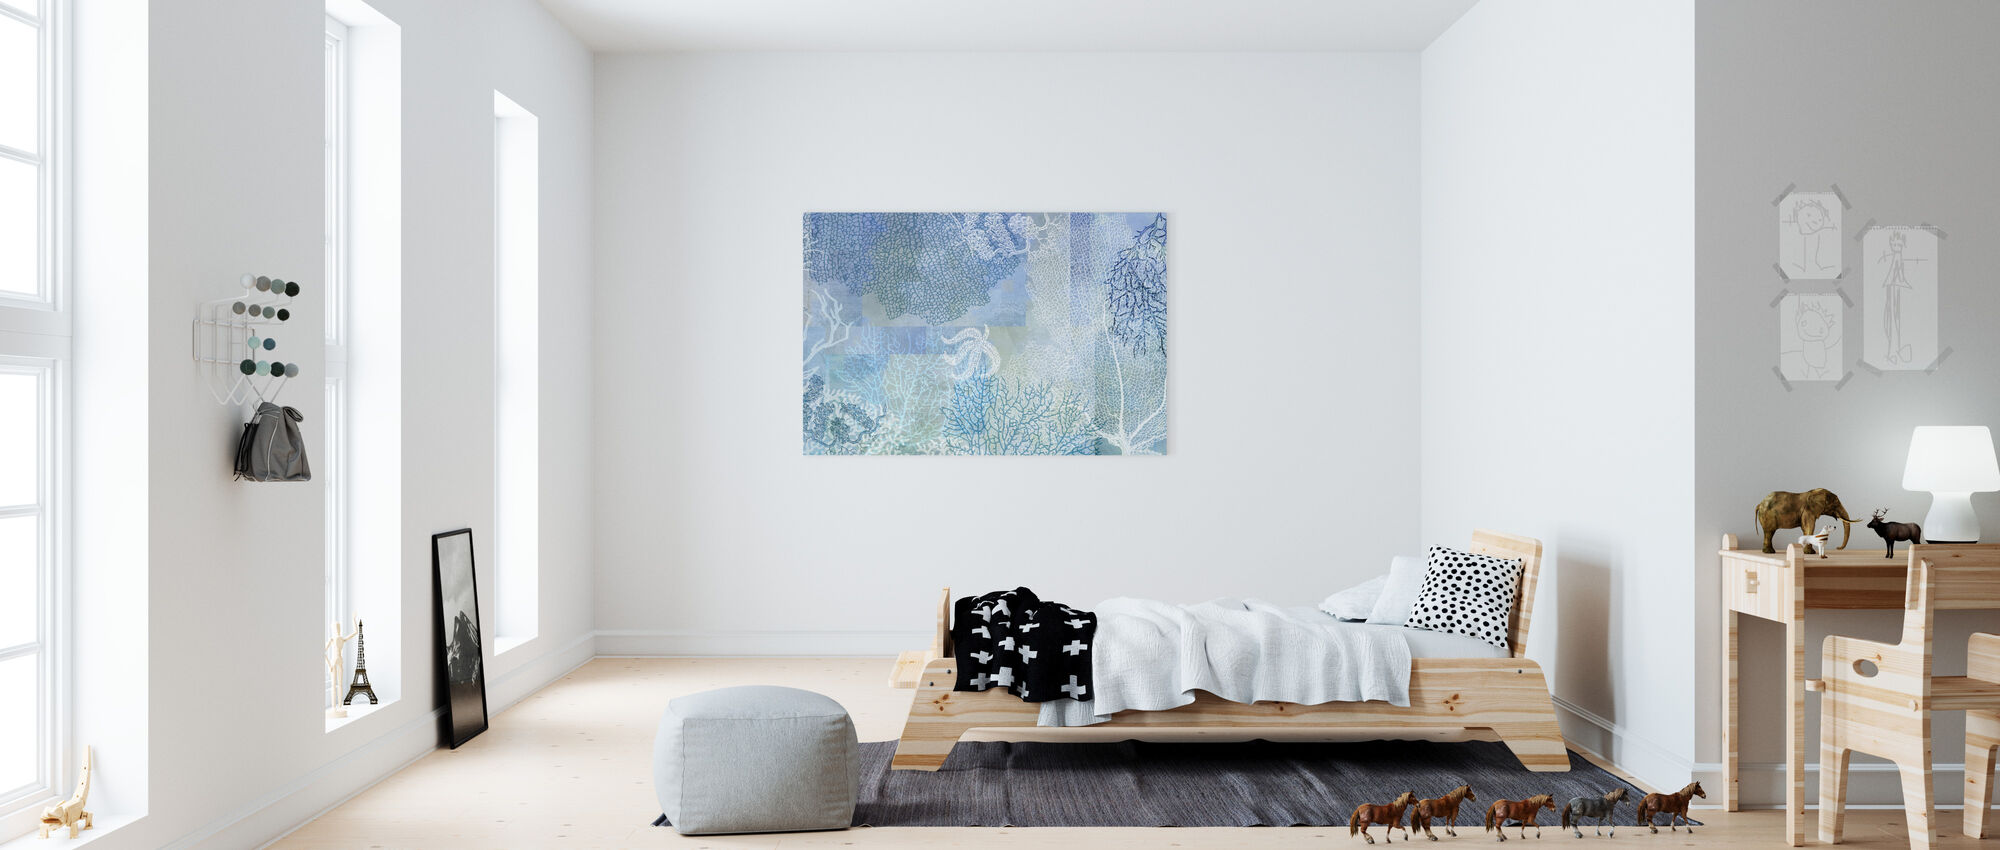 Blue Sea Water - Canvas print - Kids Room